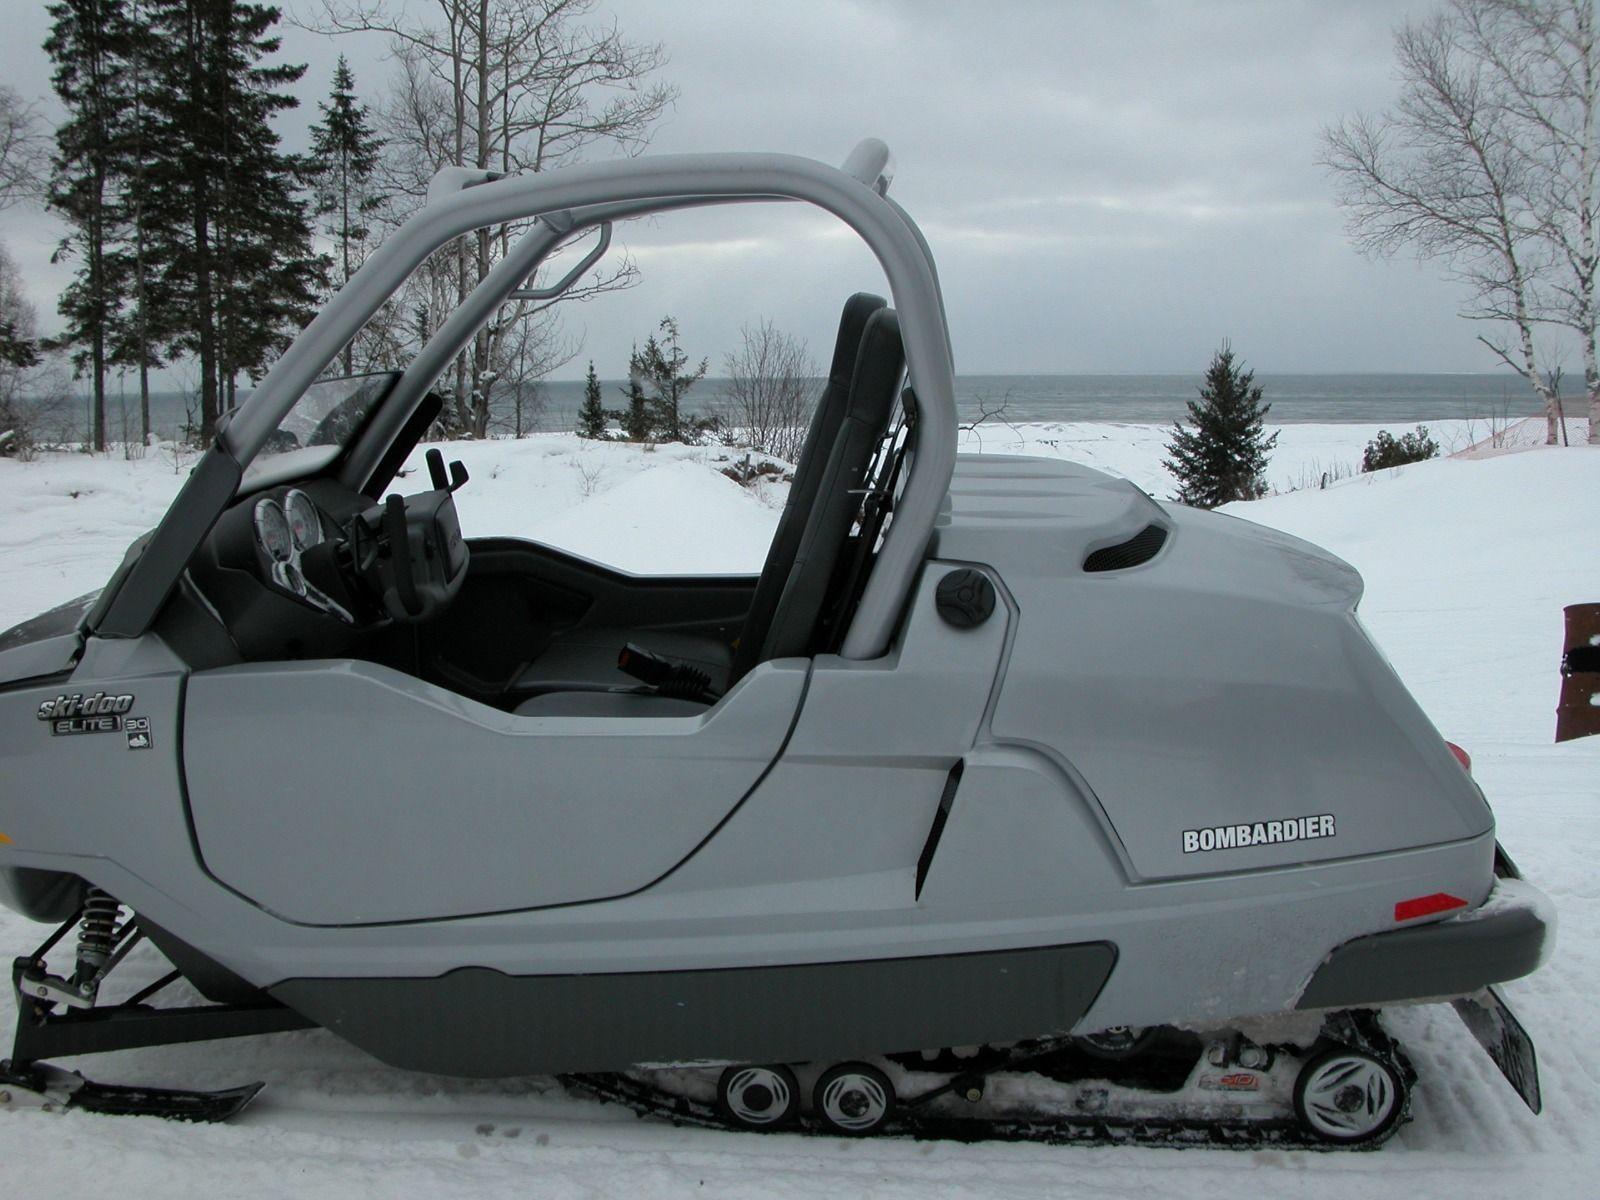 2004 Ski-doo ELITE   Fitness   Snow vehicles, Skiing, Sled